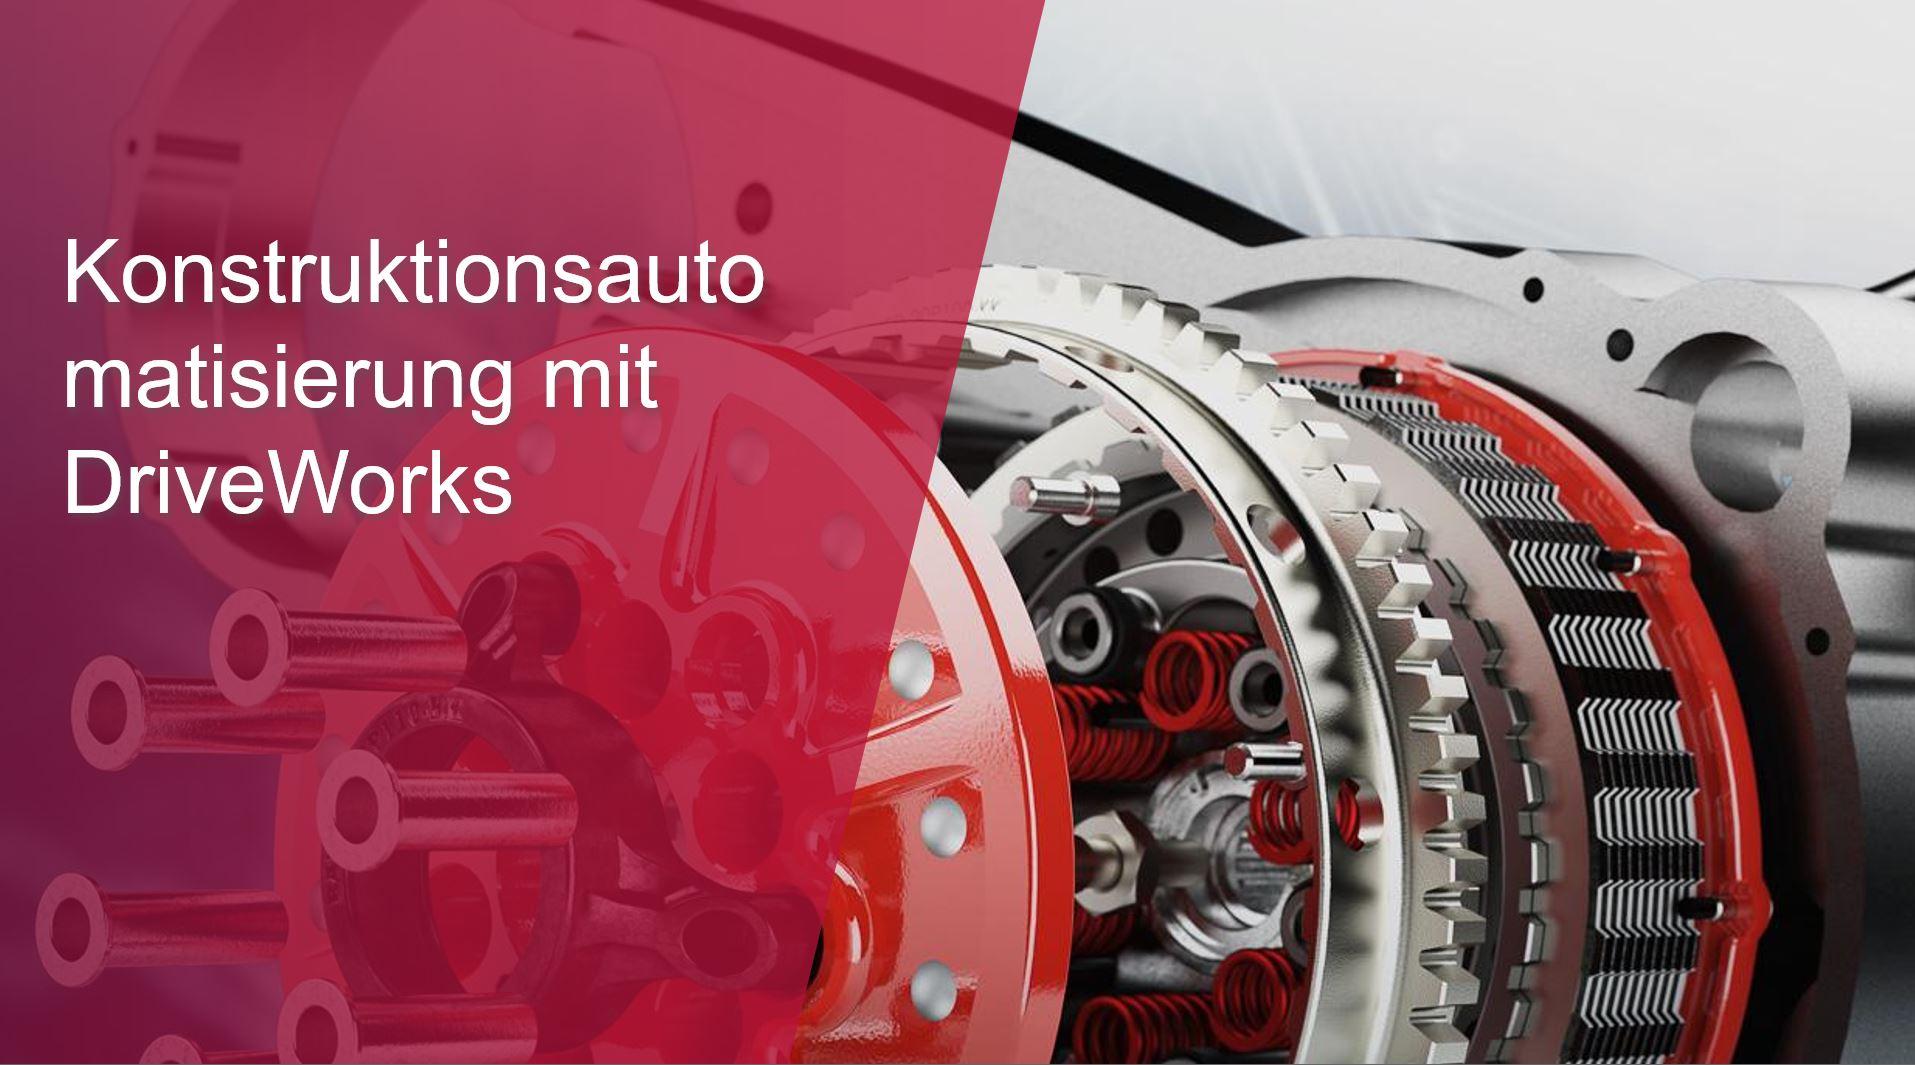 Thumbnail_Konstruktionsautomatisierung mit DriveWorks